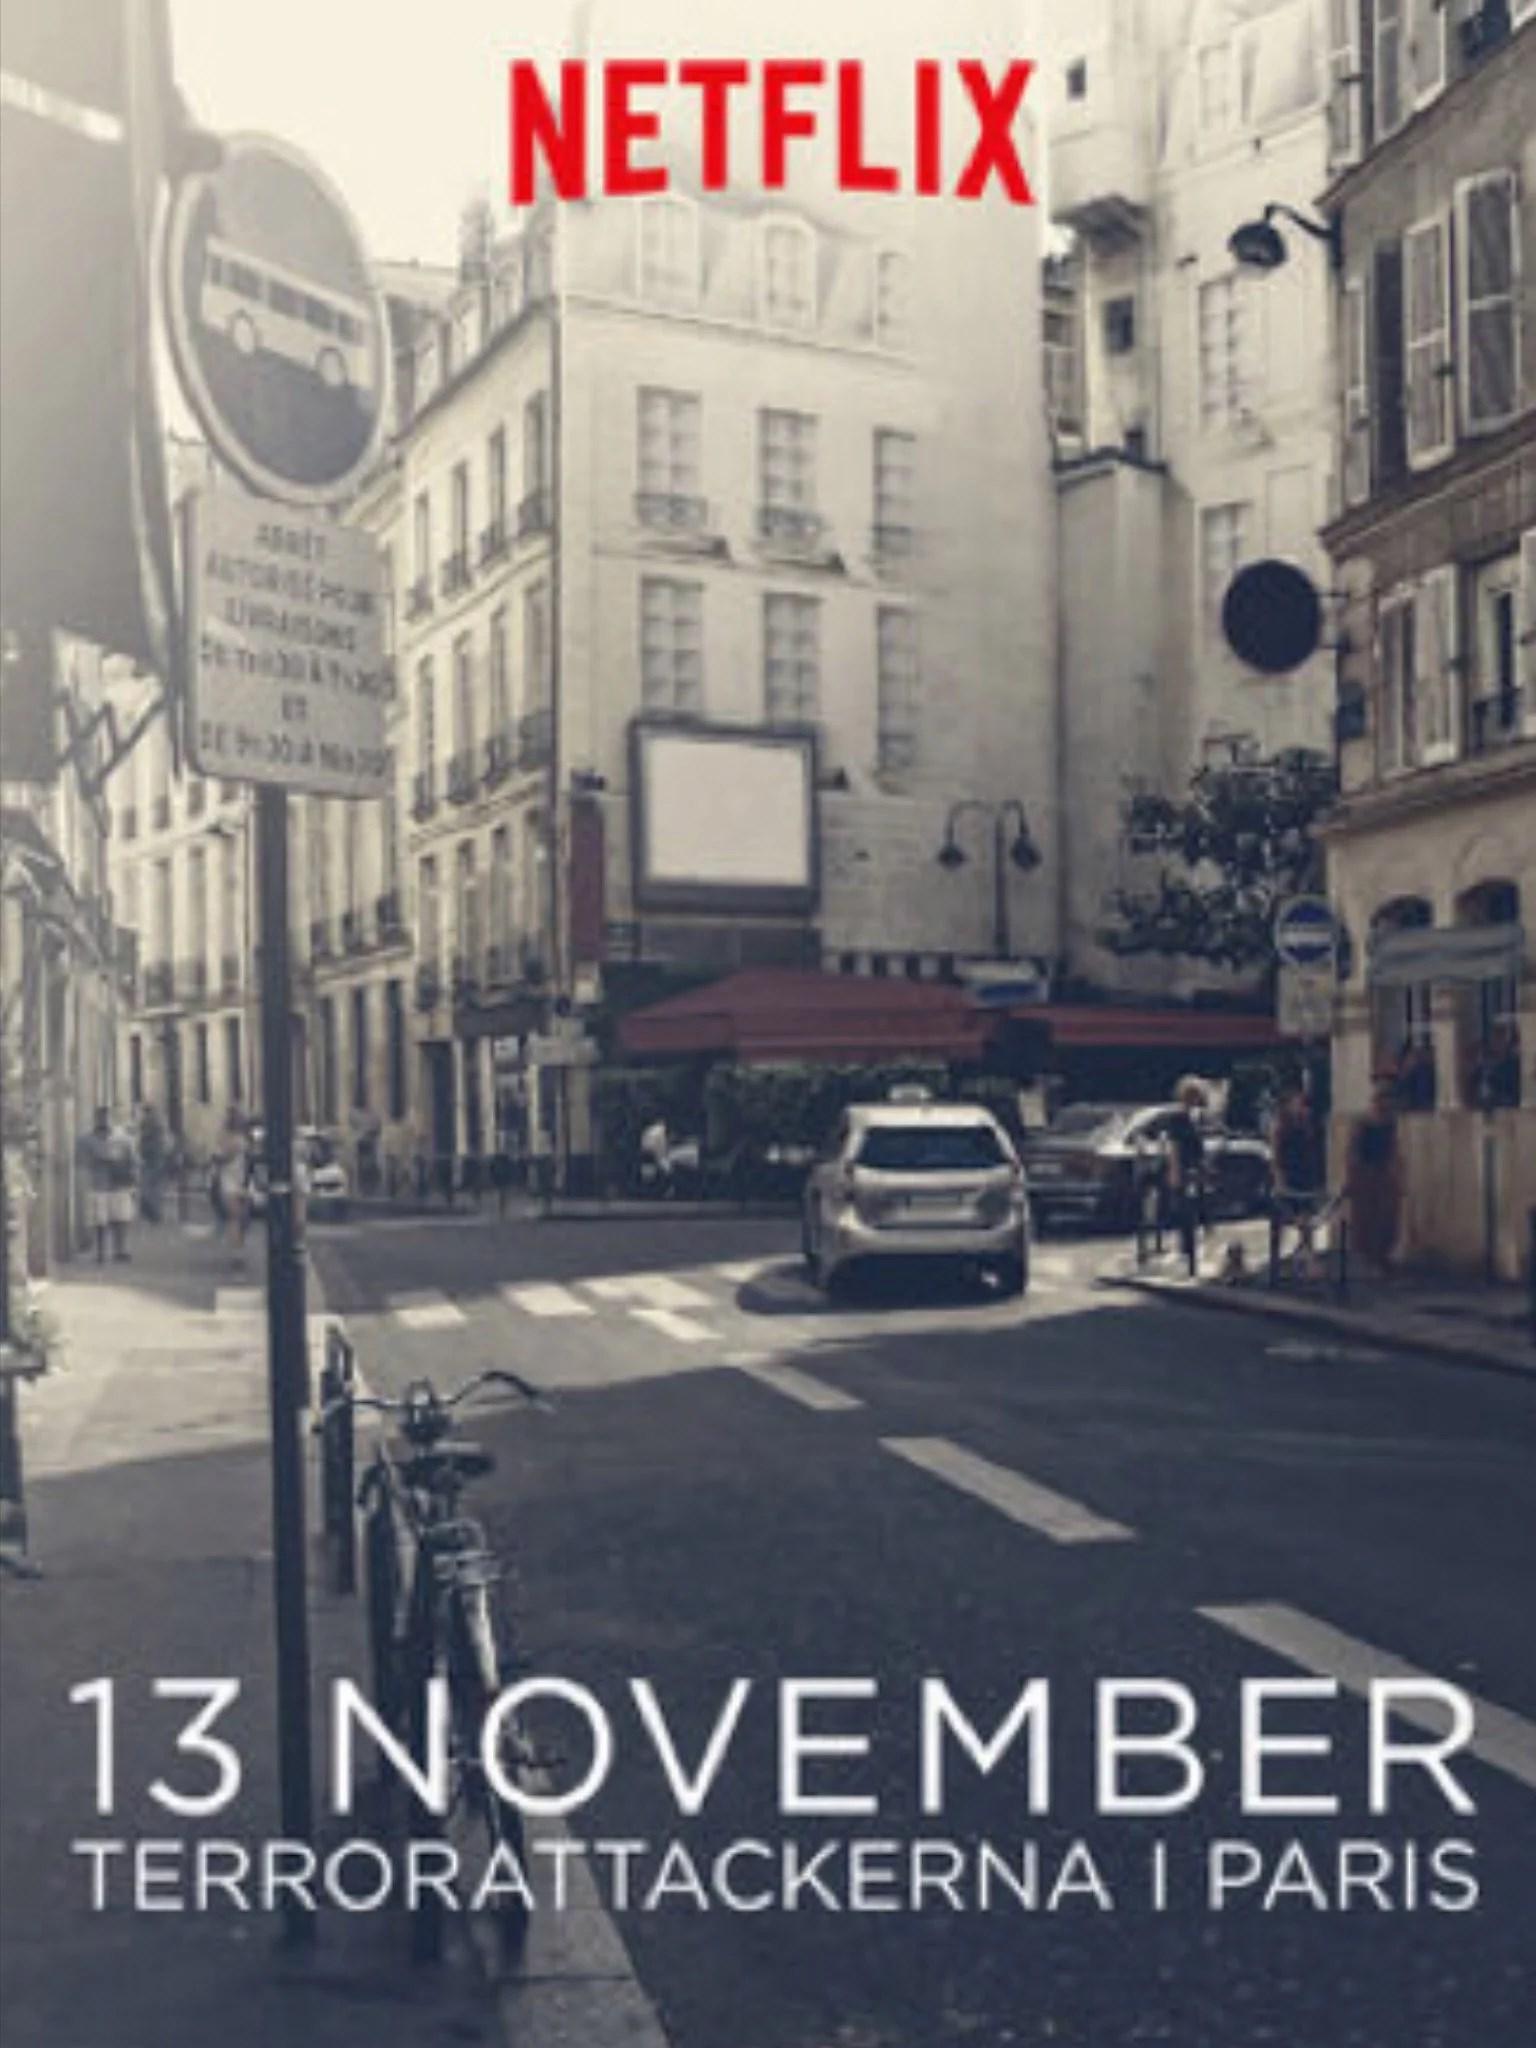 Fredag 13 november.